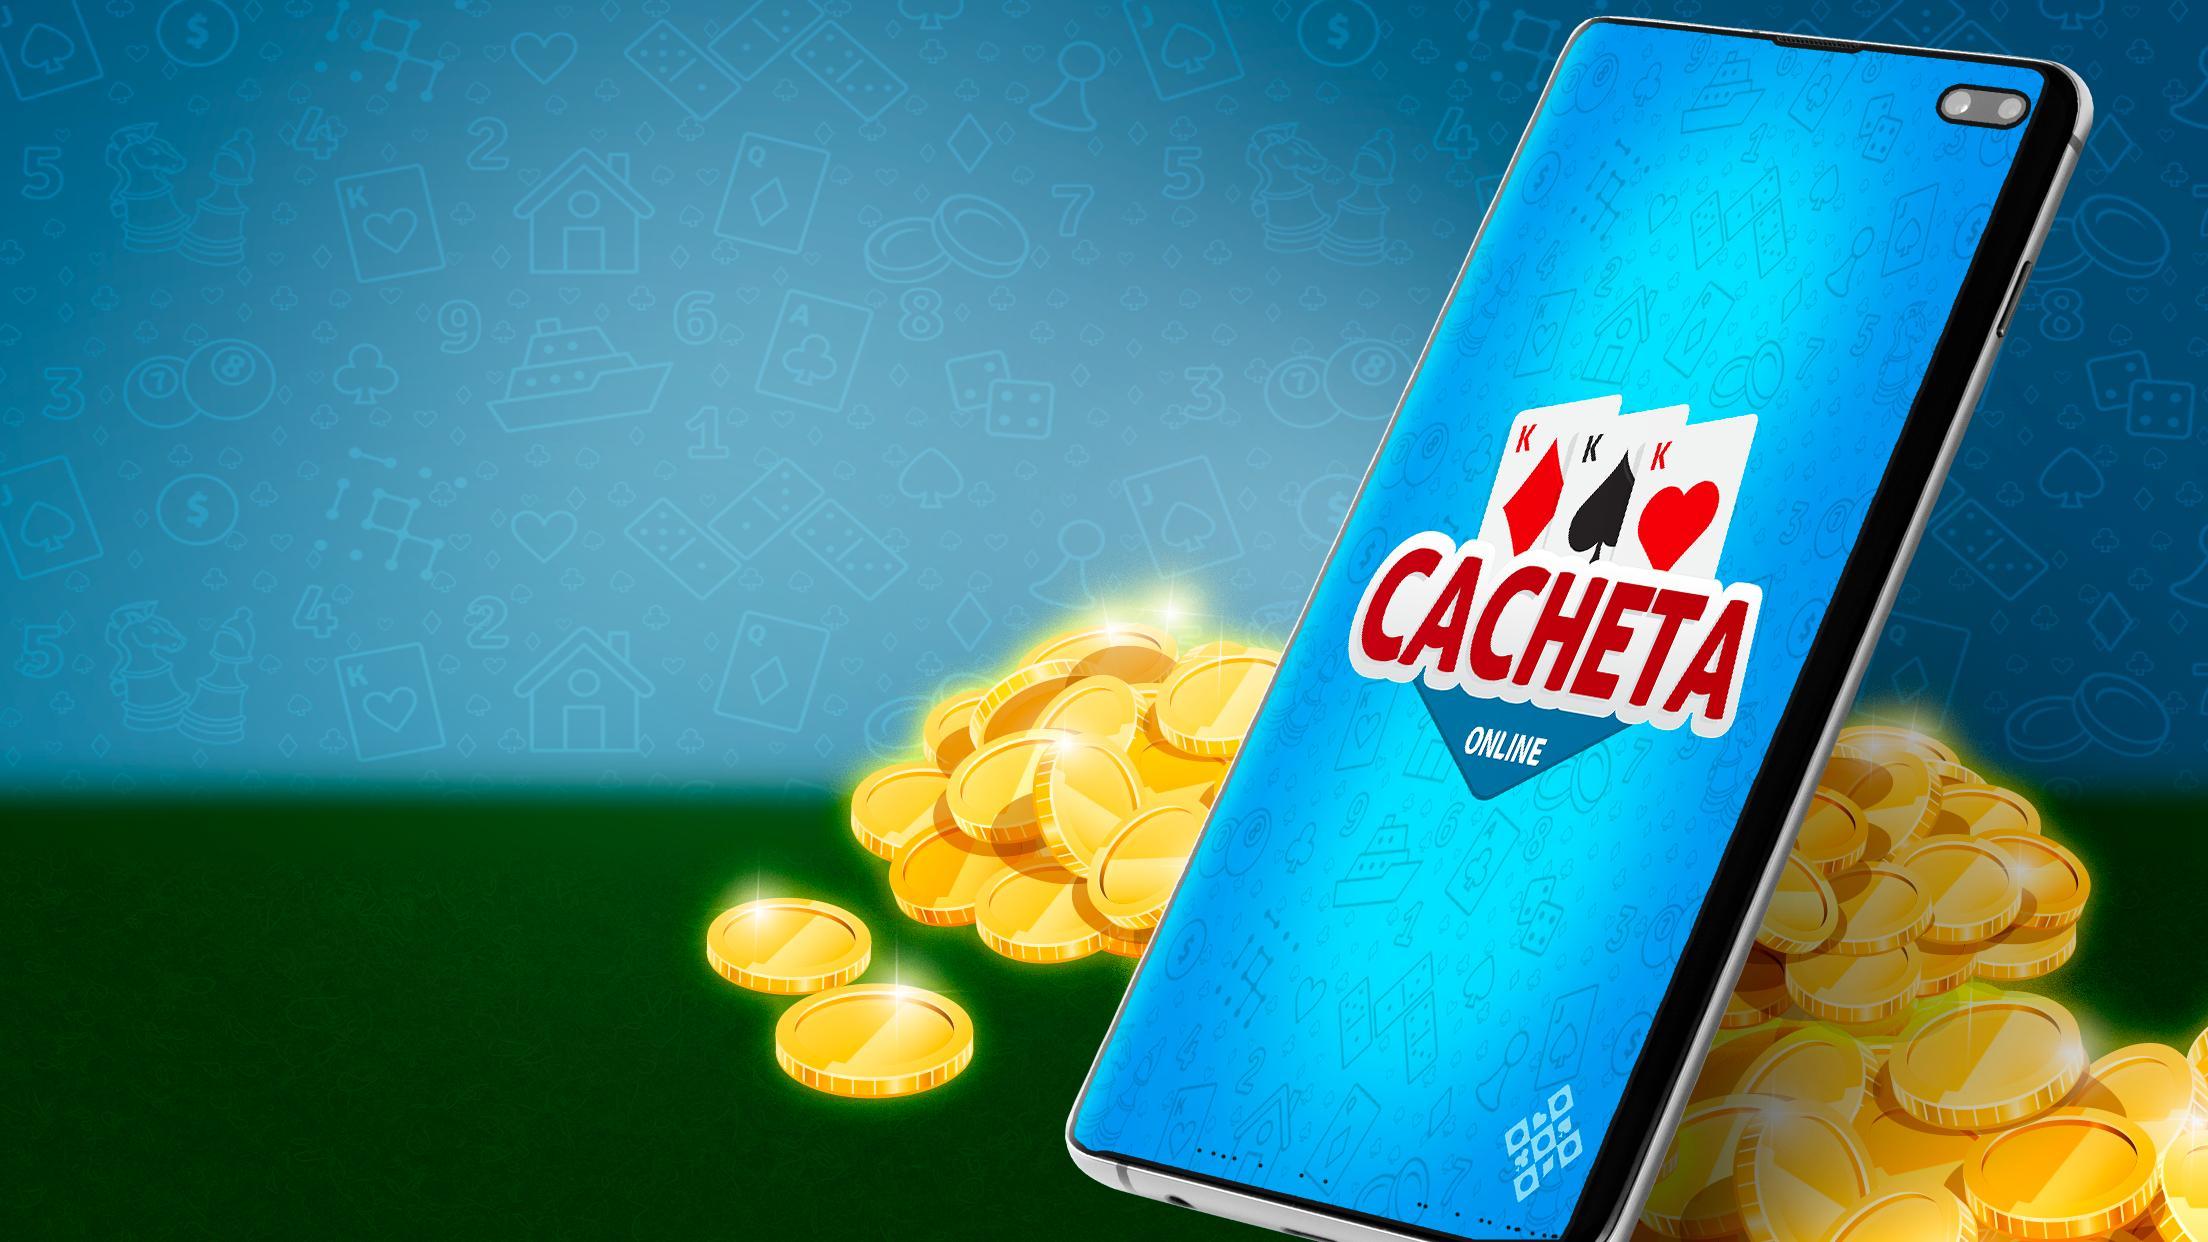 Cacheta Gin Rummy Online 99.1.23 Screenshot 2